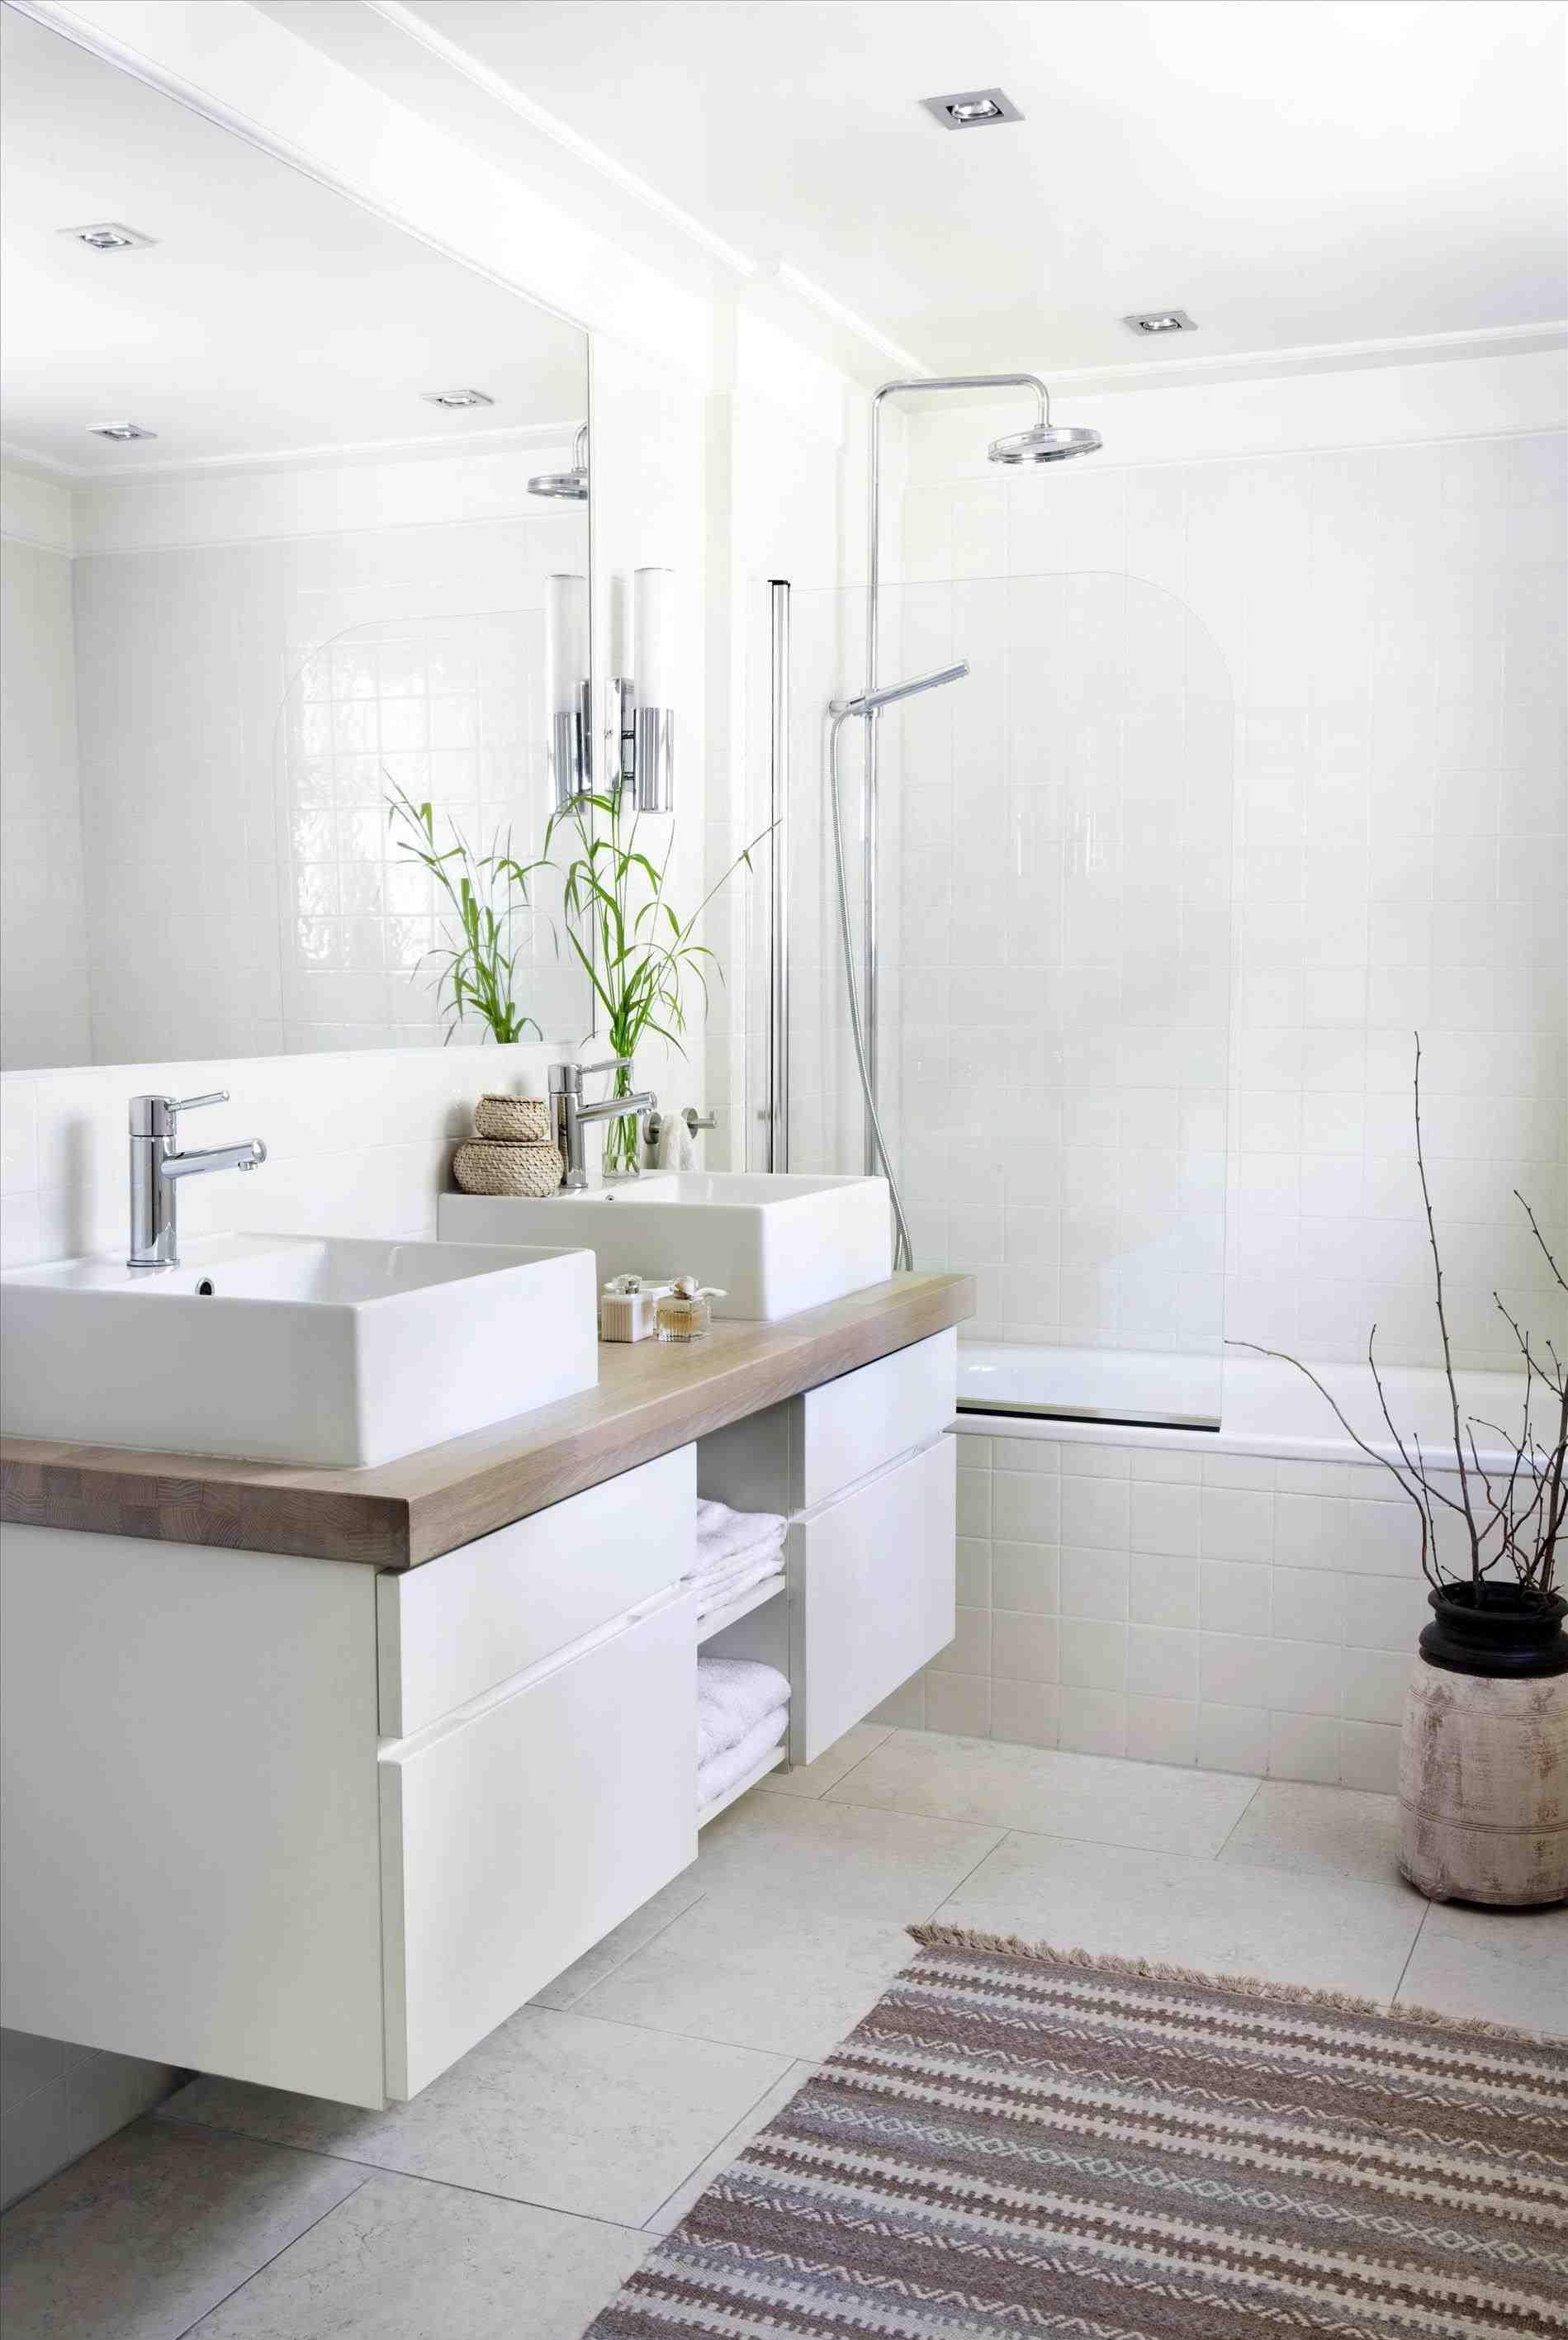 Маленькая ванная комната с двумя раковинами